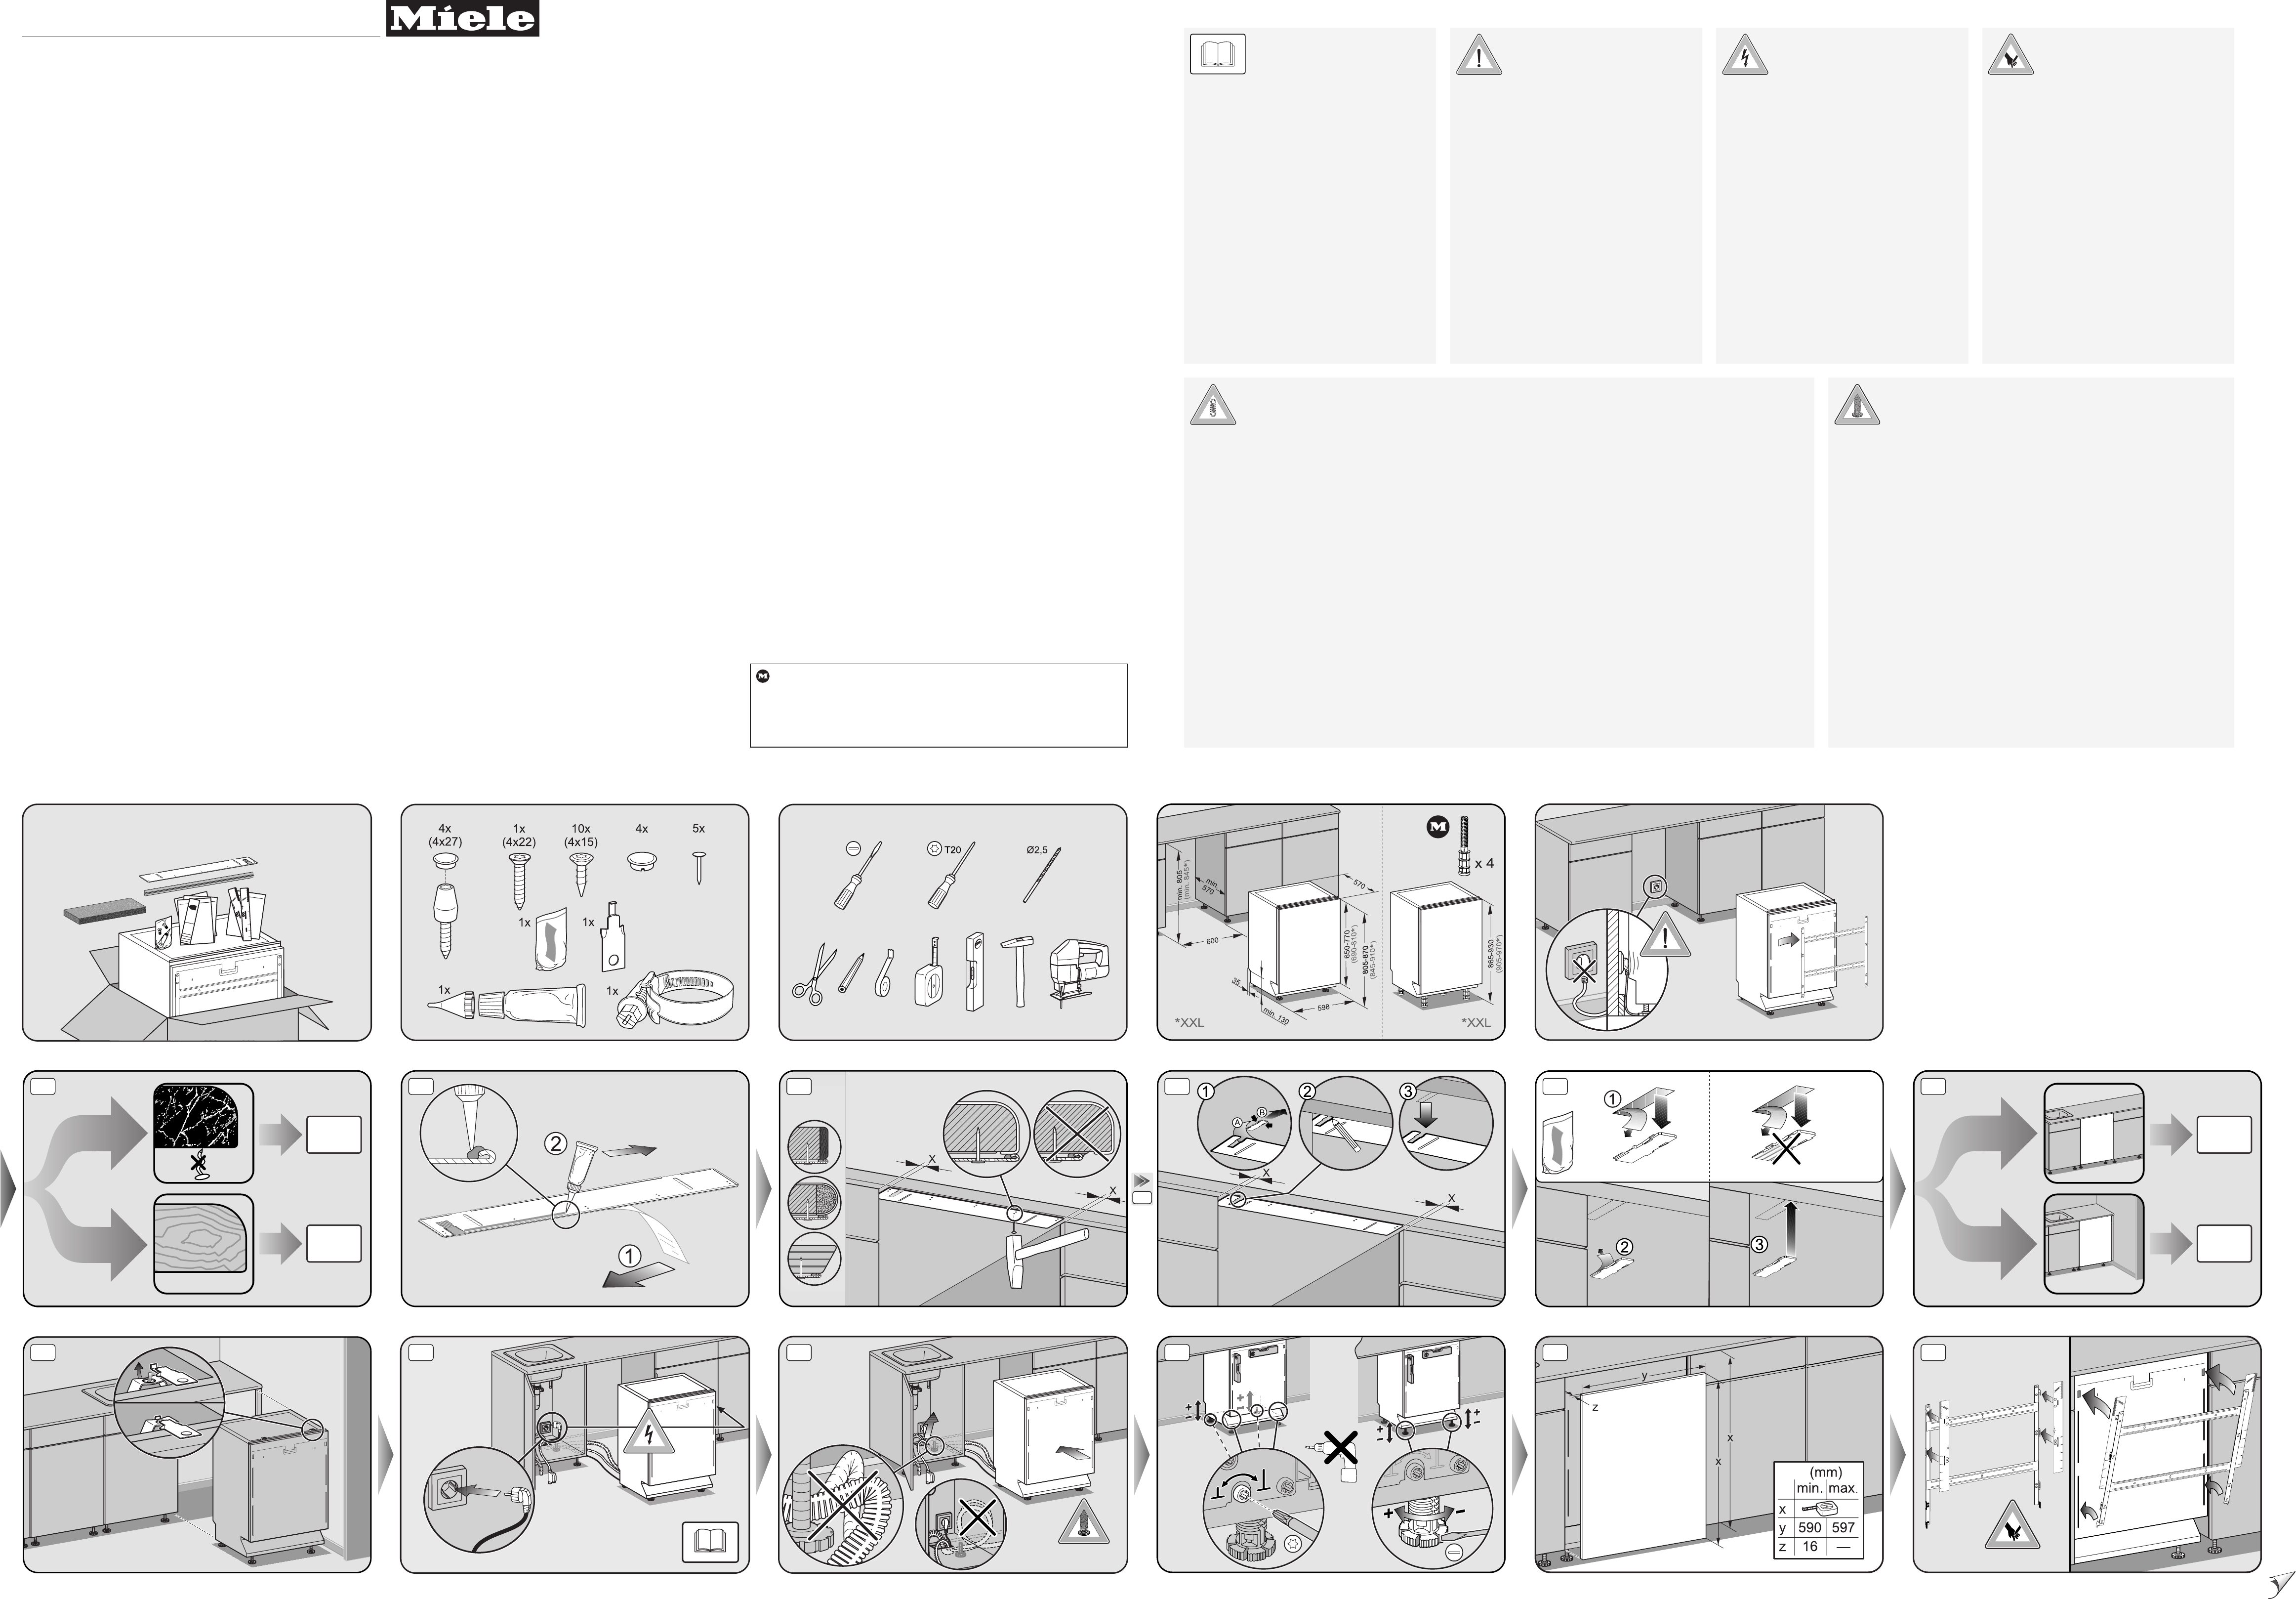 handleiding miele g 658 3 scvi plus pagina 1 van 2 alle talen. Black Bedroom Furniture Sets. Home Design Ideas